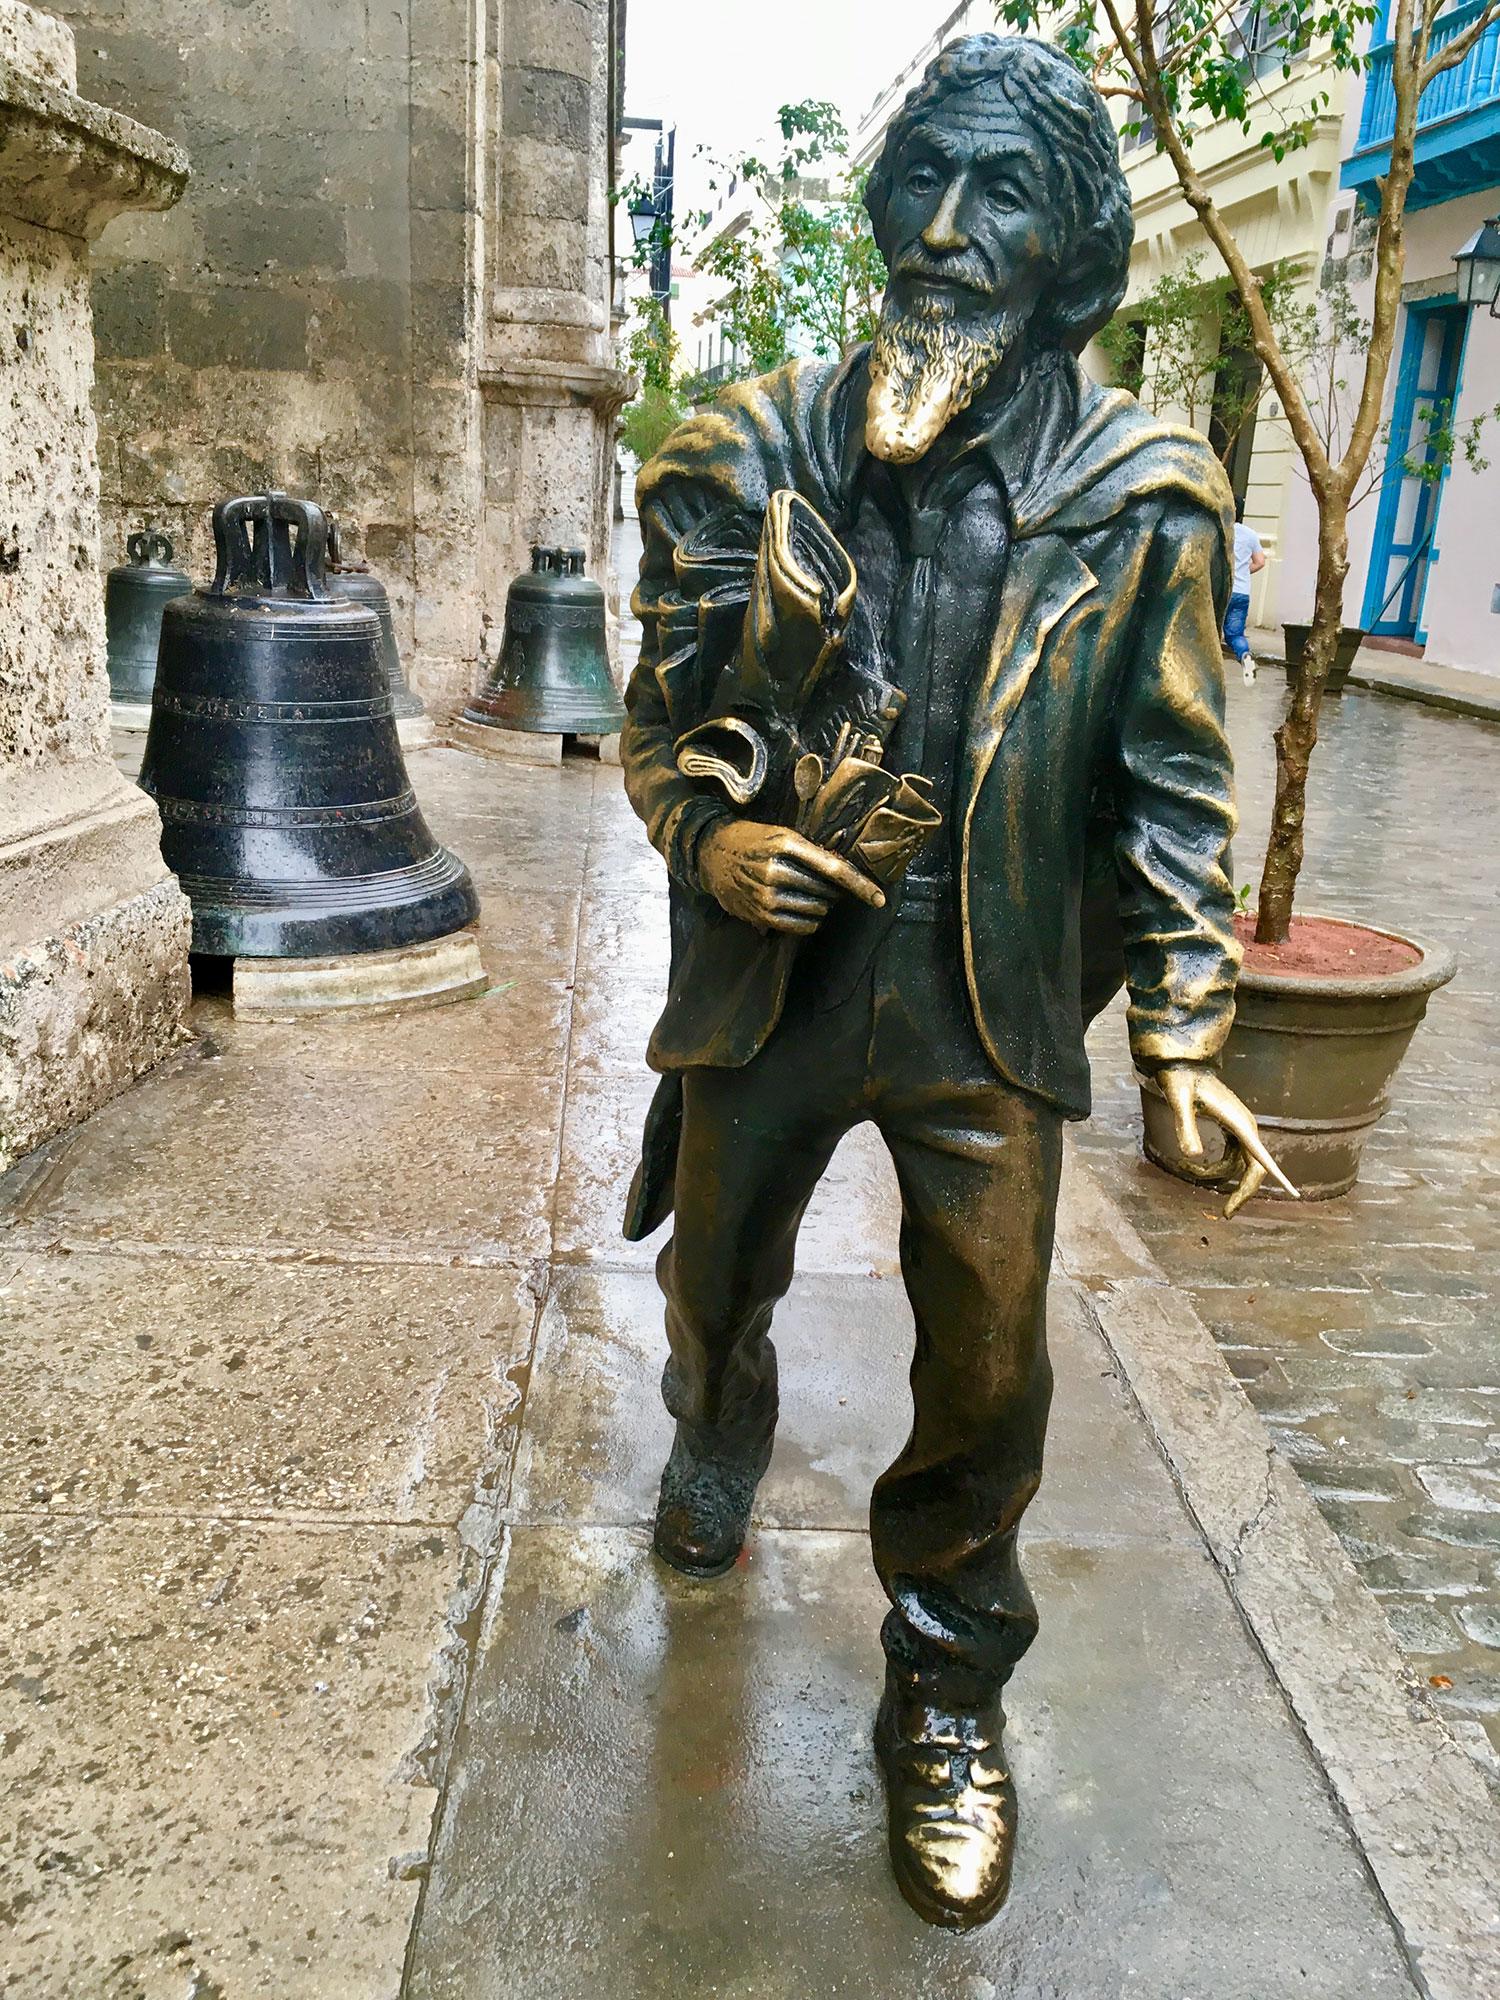 Hammocks_and_Ruins_What_to_Do_Cuba_Havana_island_socialist_101.jpg